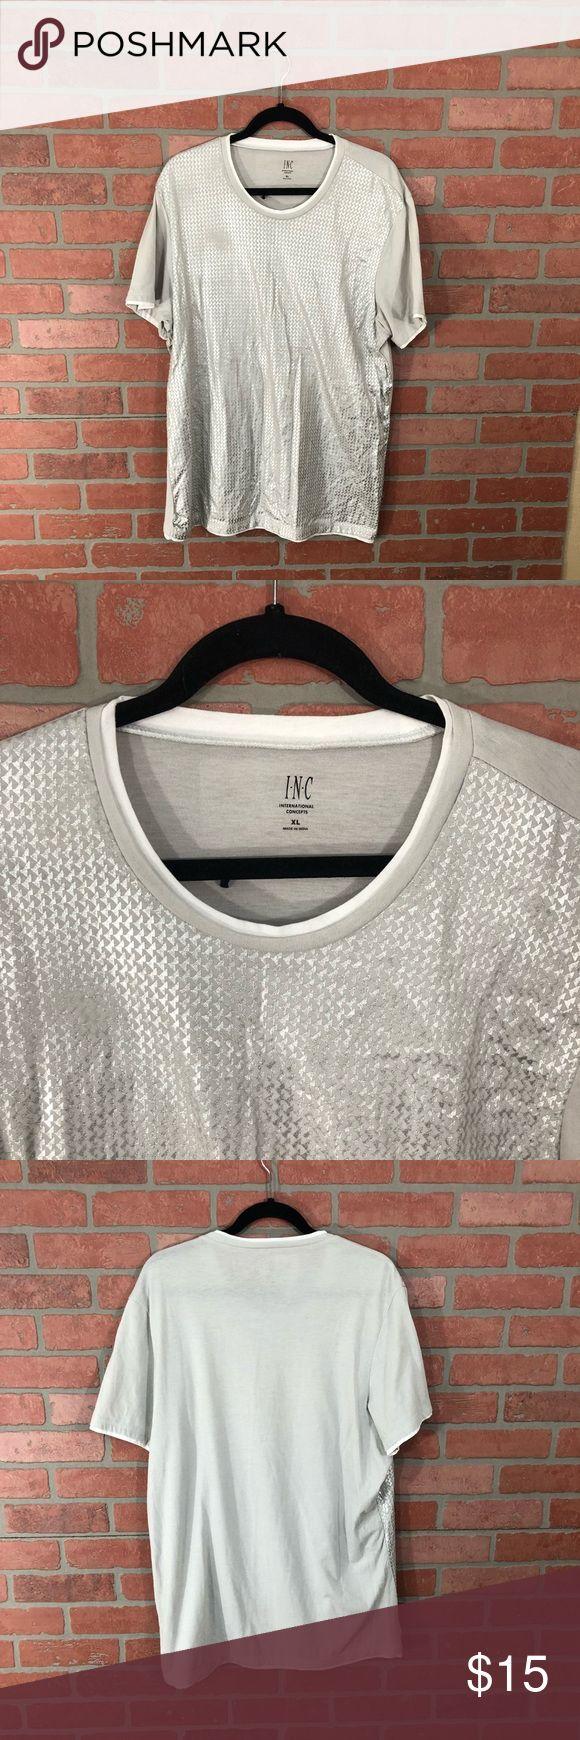 INC silver T-Shirt INC  Fun Silver/gray shirt  Size XL INC International Concepts Shirts Tees - Short Sleeve